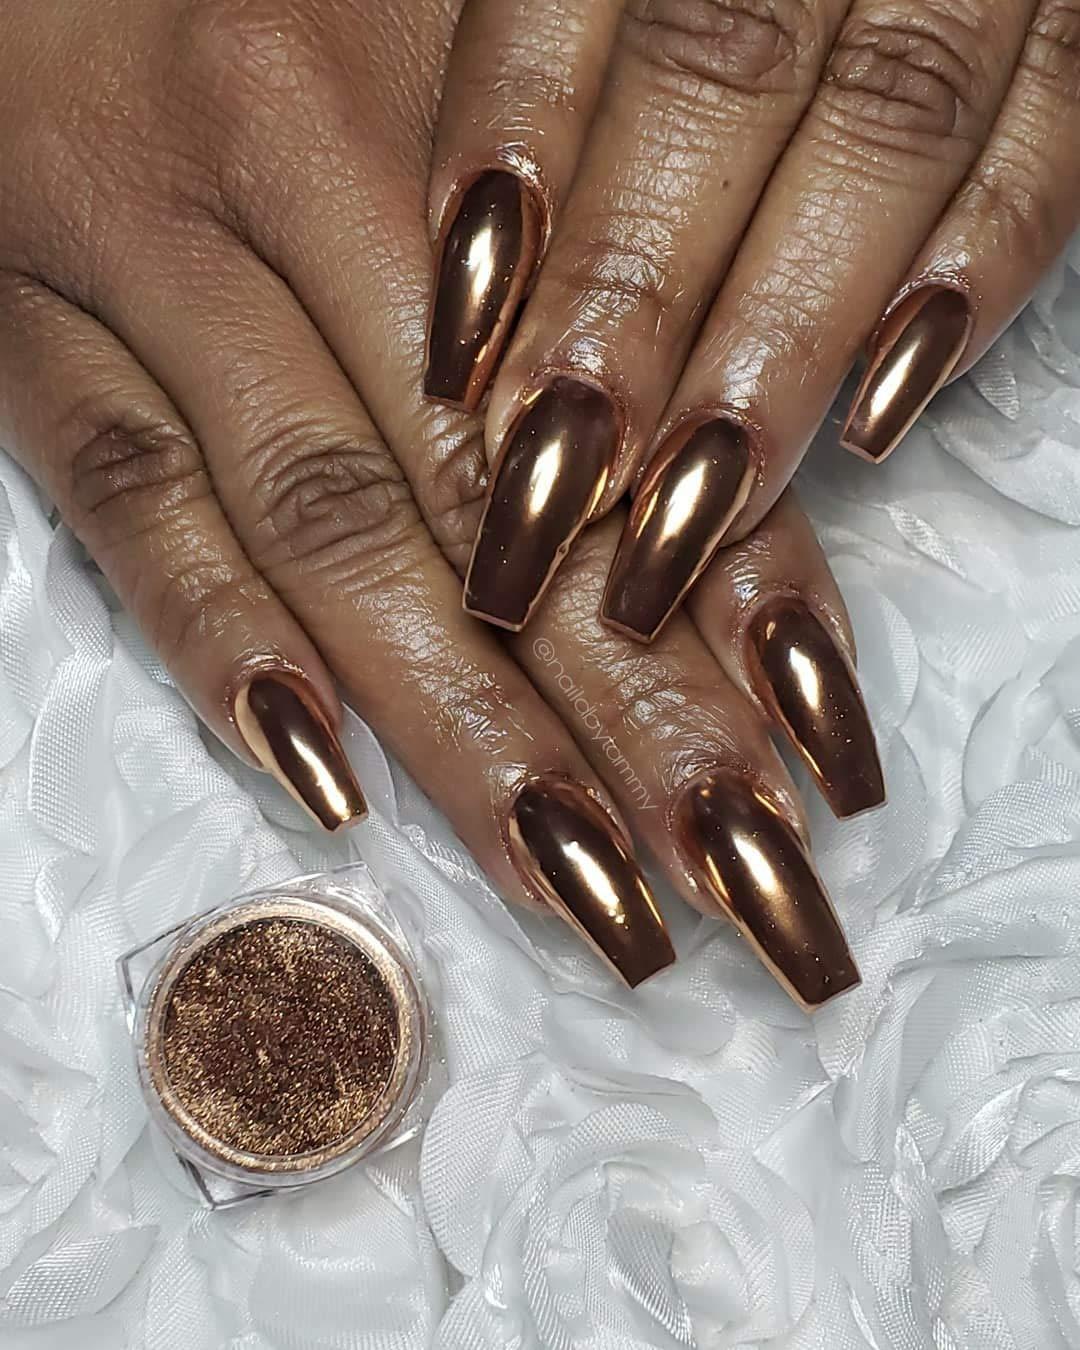 Tempea Golden Cinnamon Bronze chameleon mirror laser chrome NAIL PIGMENT POWDER nail art chrome MIRROR effect NAIL FOIL POWDER shiny nail dust holographic unicorn shiny laser nail sequin (Bronze) by Tempea